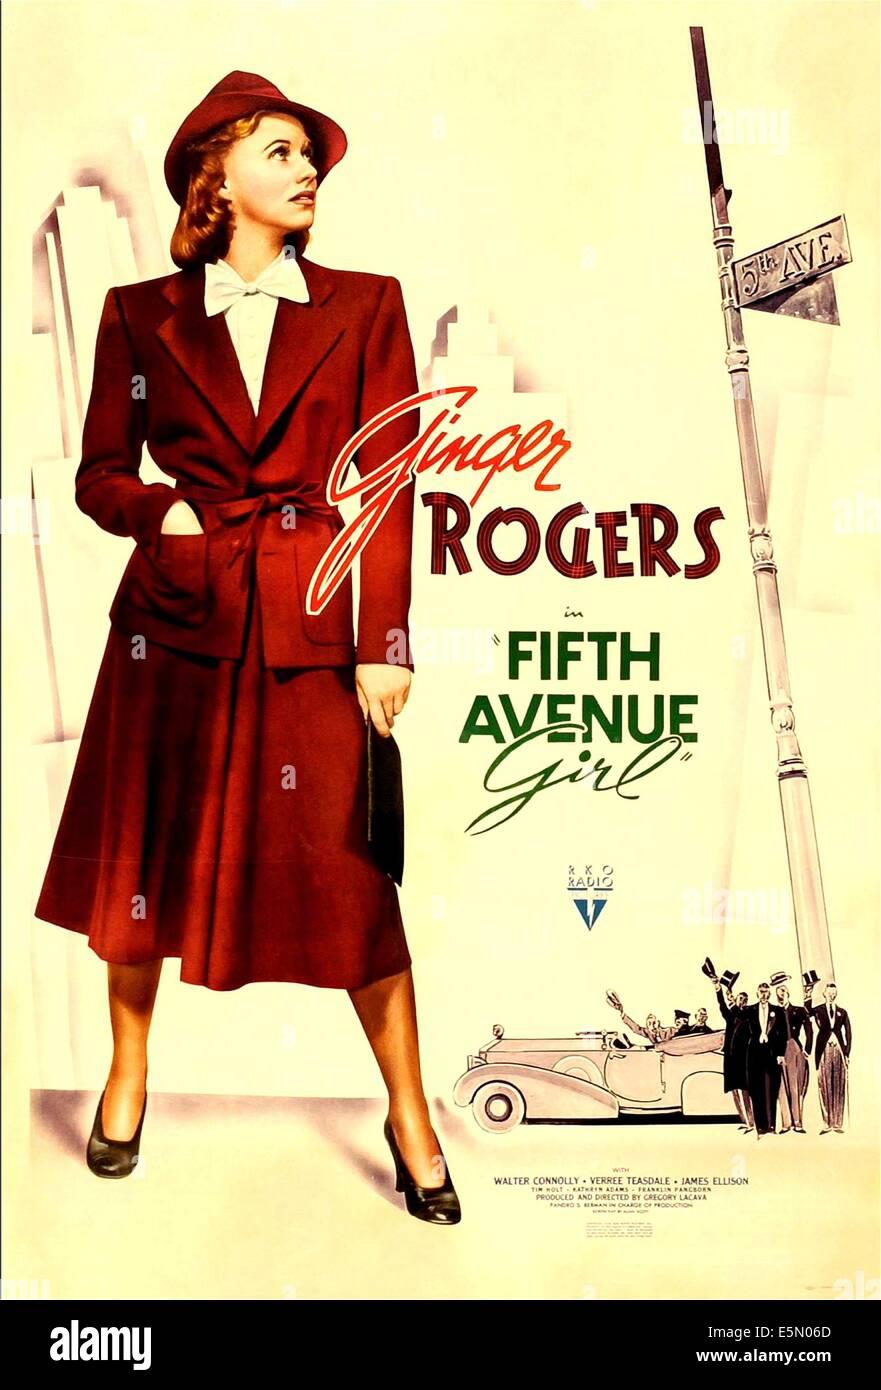 FIFTH AVENUE GIRL (aka 5TH AVE GIRL), Ginger Rogers, 1939. - Stock Image